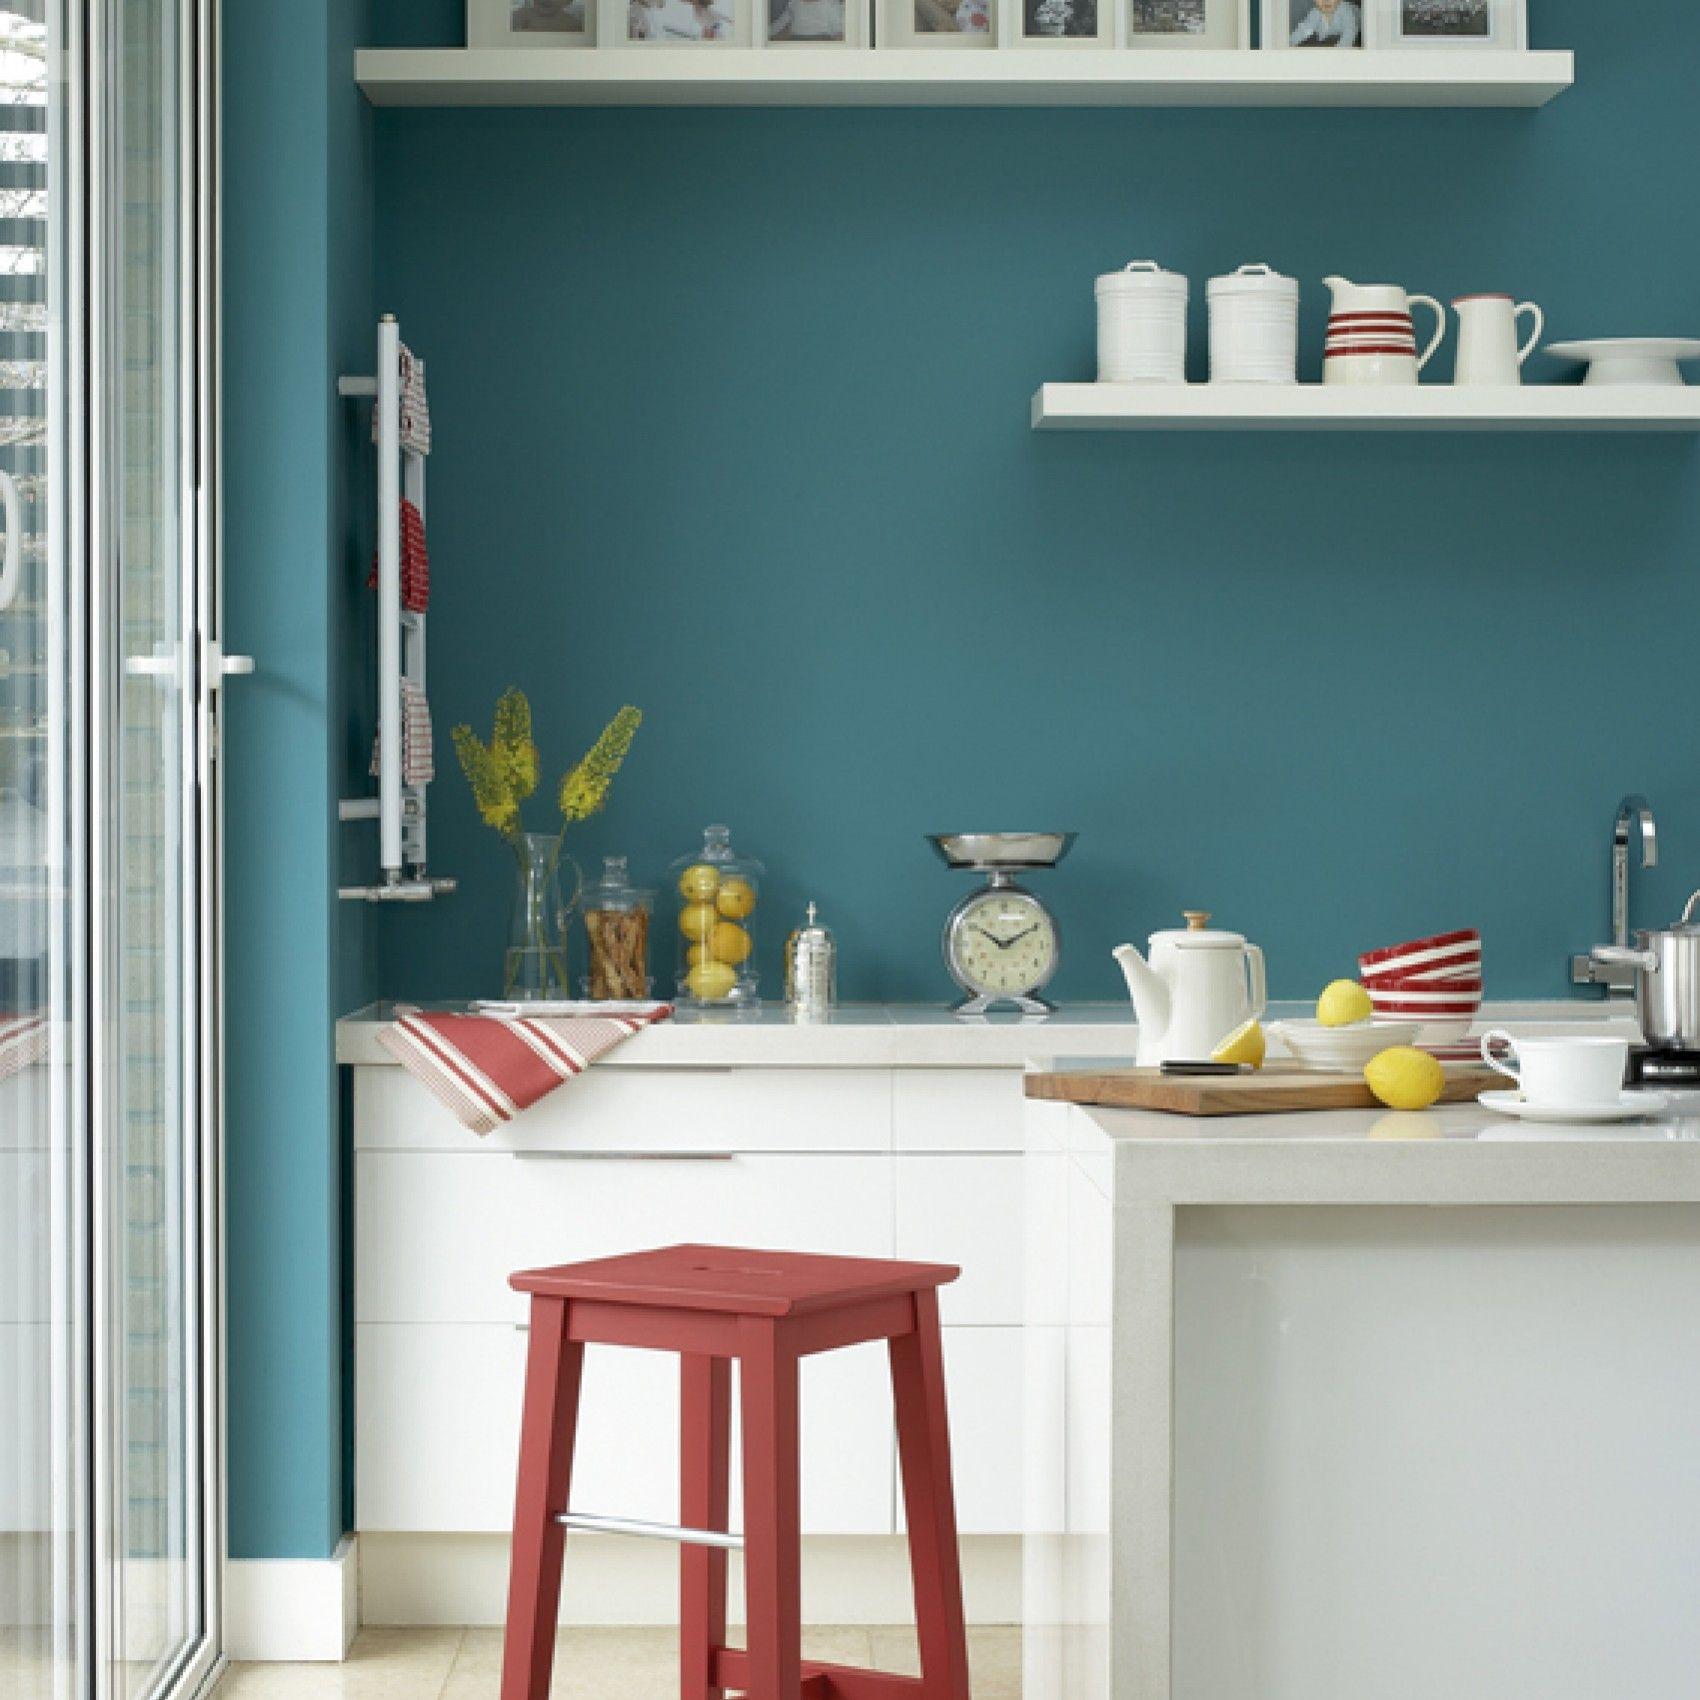 Canton Nr 94 Lrw Lichtreflexionswert 21 Diese Farbe Wurde  # Muebles Farbton